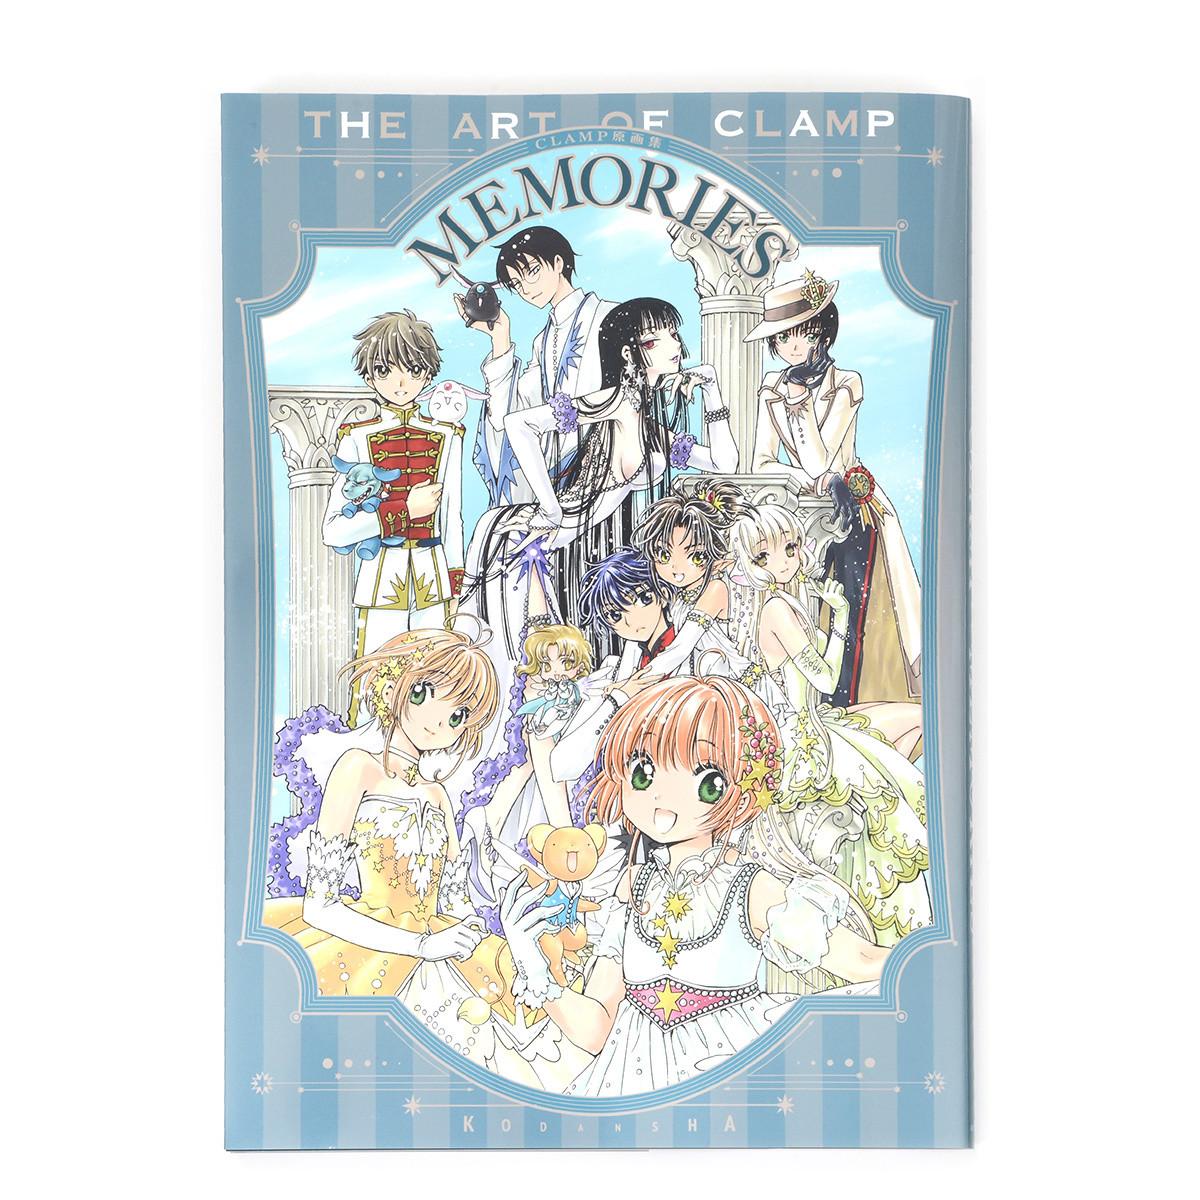 The Art Of Clamp Memories Book Japan Cardcaptor Sakura Rayearth Tsubasa Clover